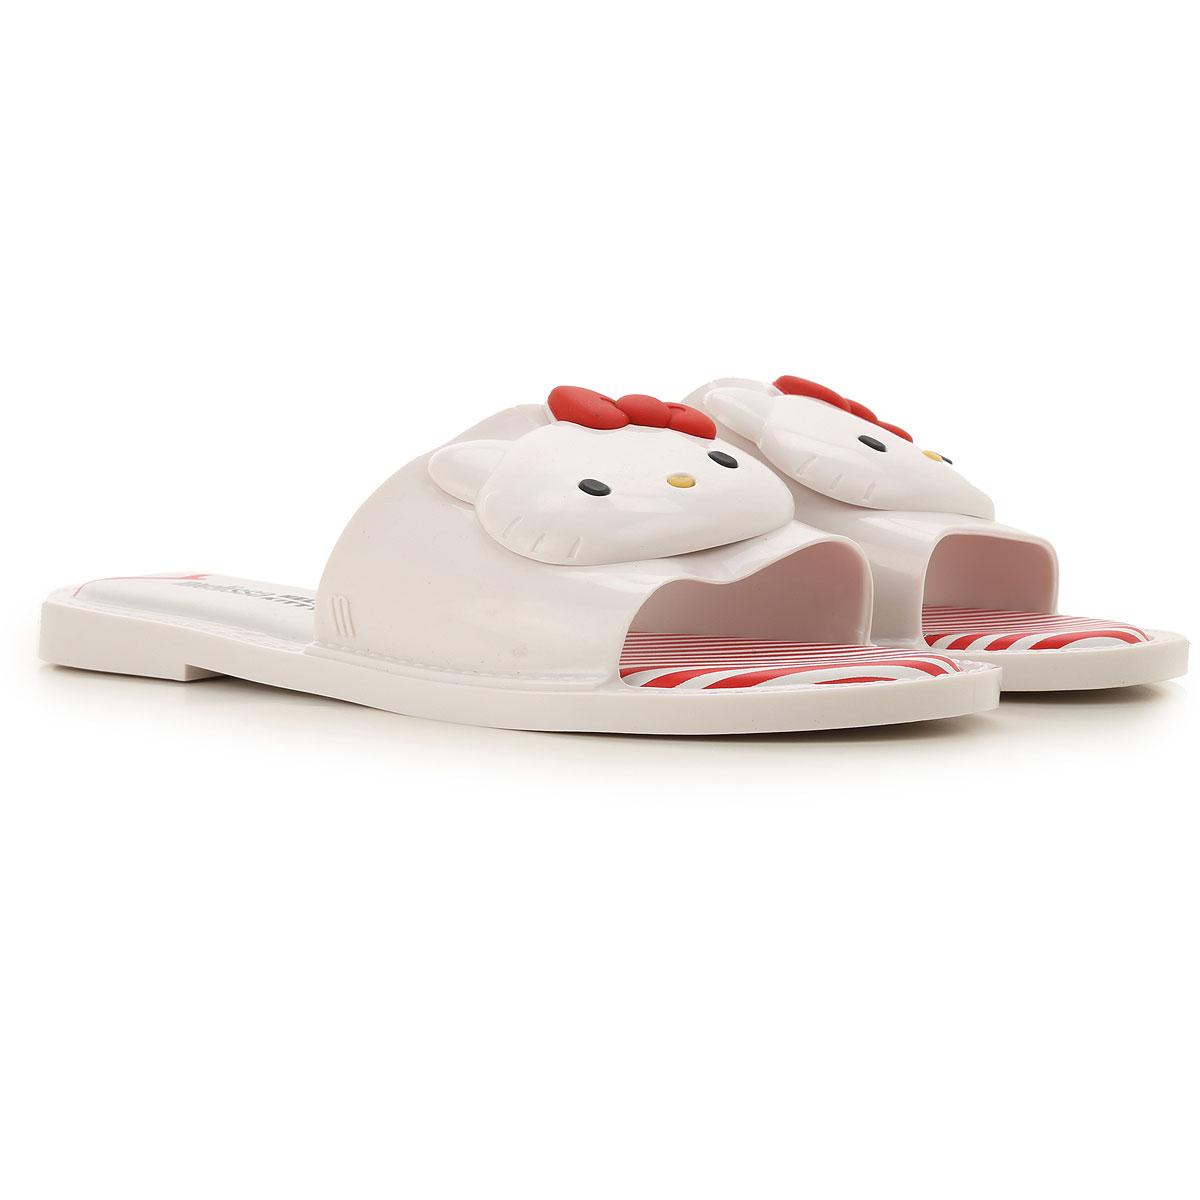 Melissa Sandals for Women On Sale, Melissa + Hello Kitty, White, PVC, 2019, USA 5 - EUR 35/36 USA 7 - EUR 38 USA 8 - EUR 39 USA 9 - EUR 40 USA 10 - EU